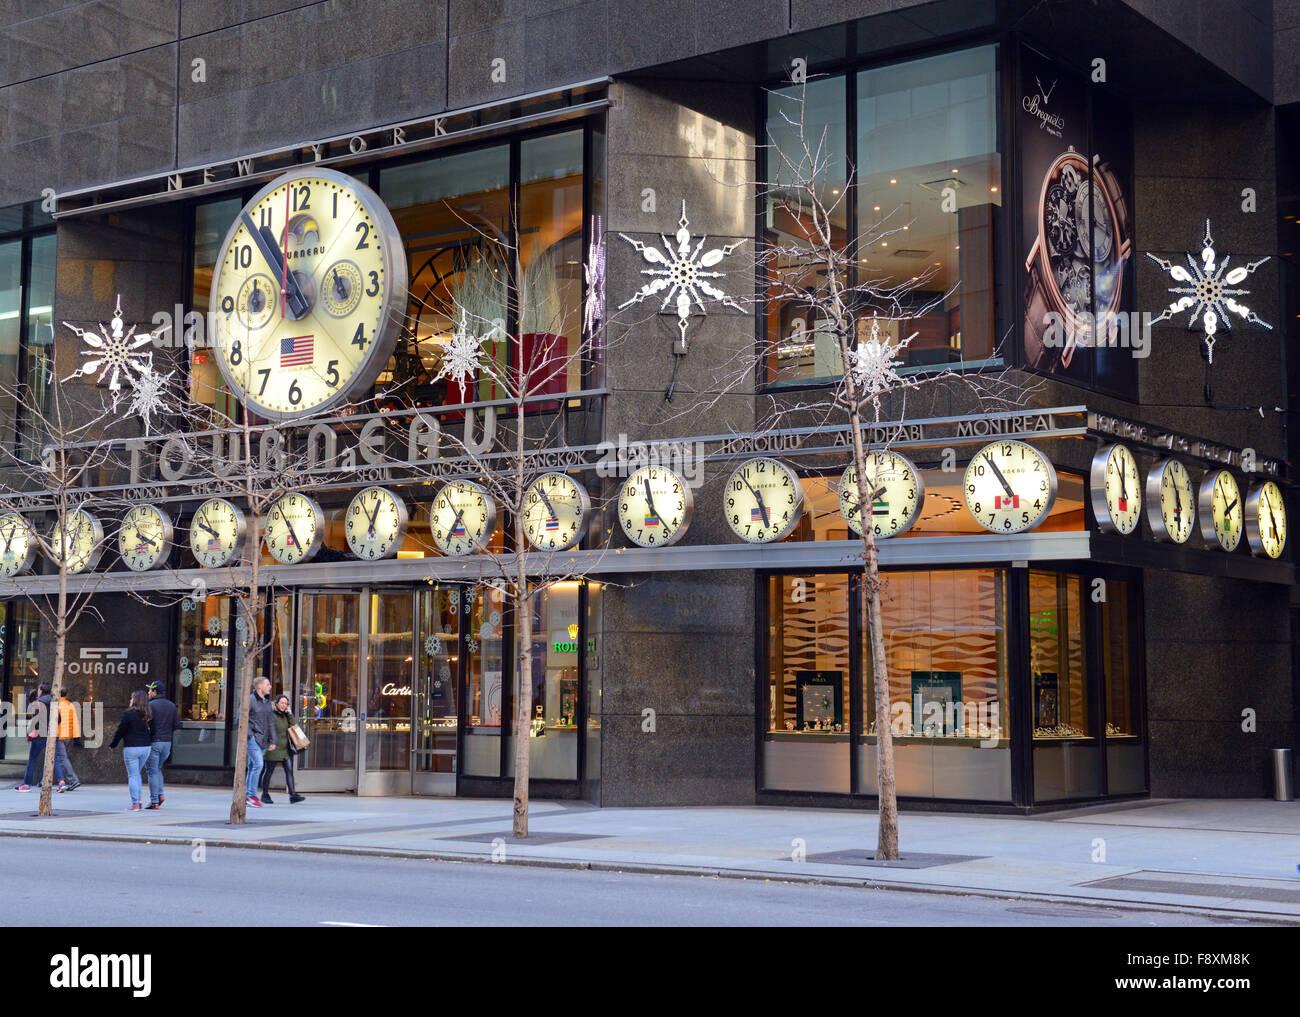 Tourneau Watches Store Stock Photos & Tourneau Watches Store